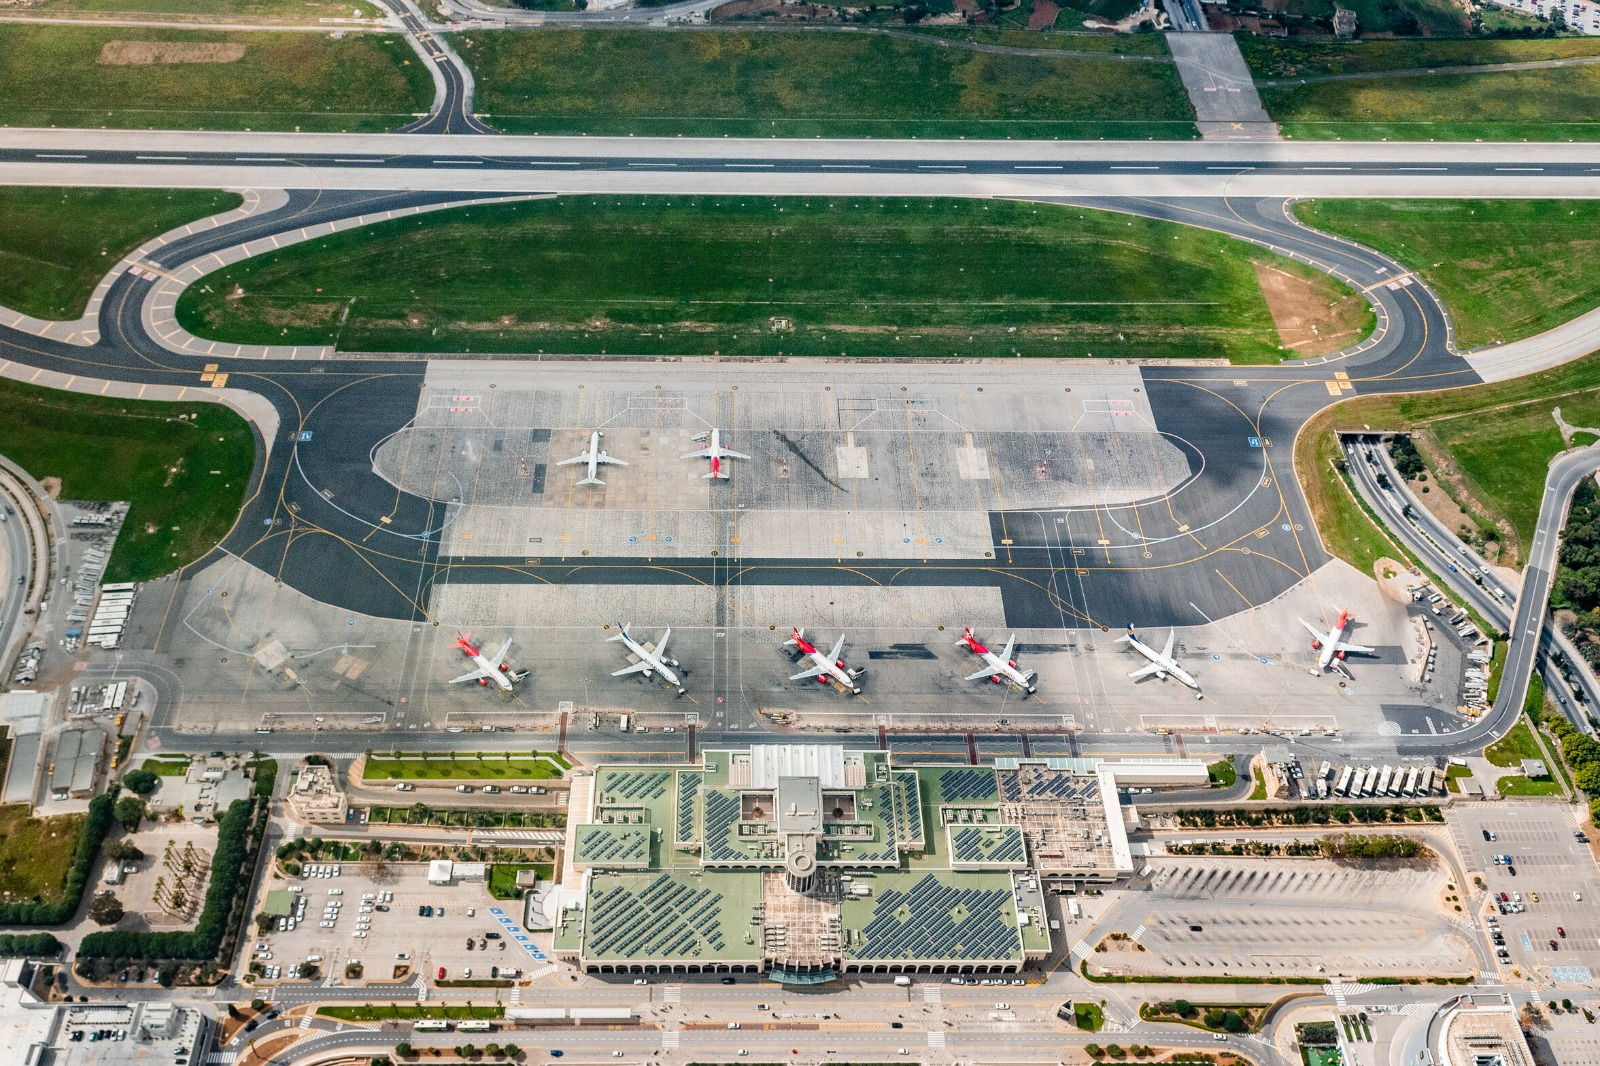 Malta International Airport Aerial 2